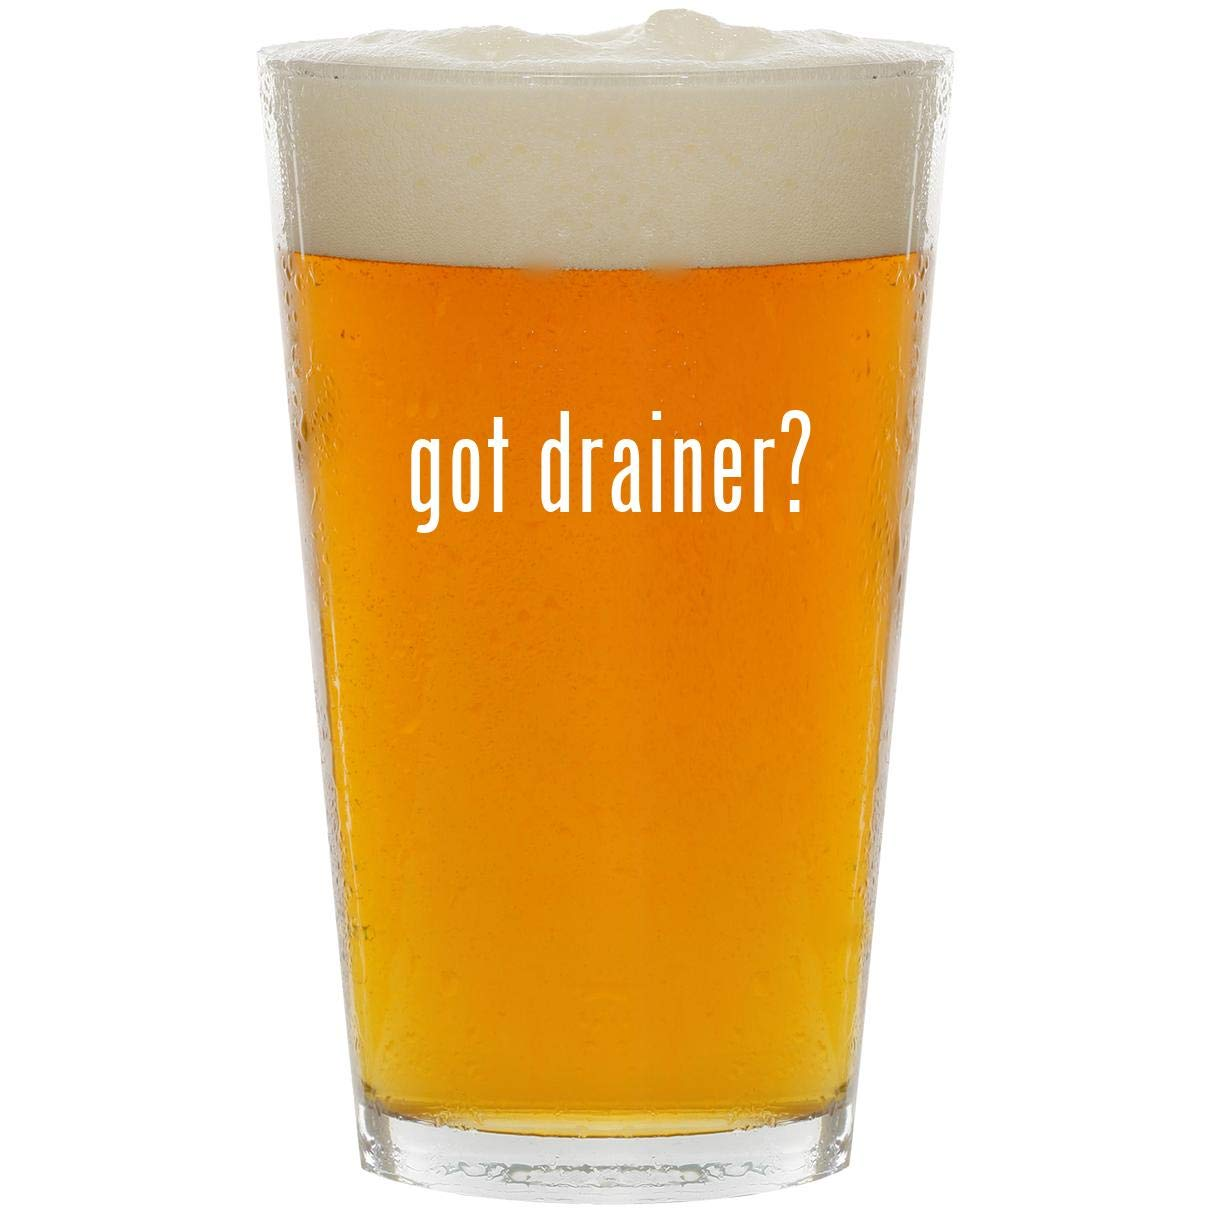 got drainer? - Glass 16oz Beer Pint